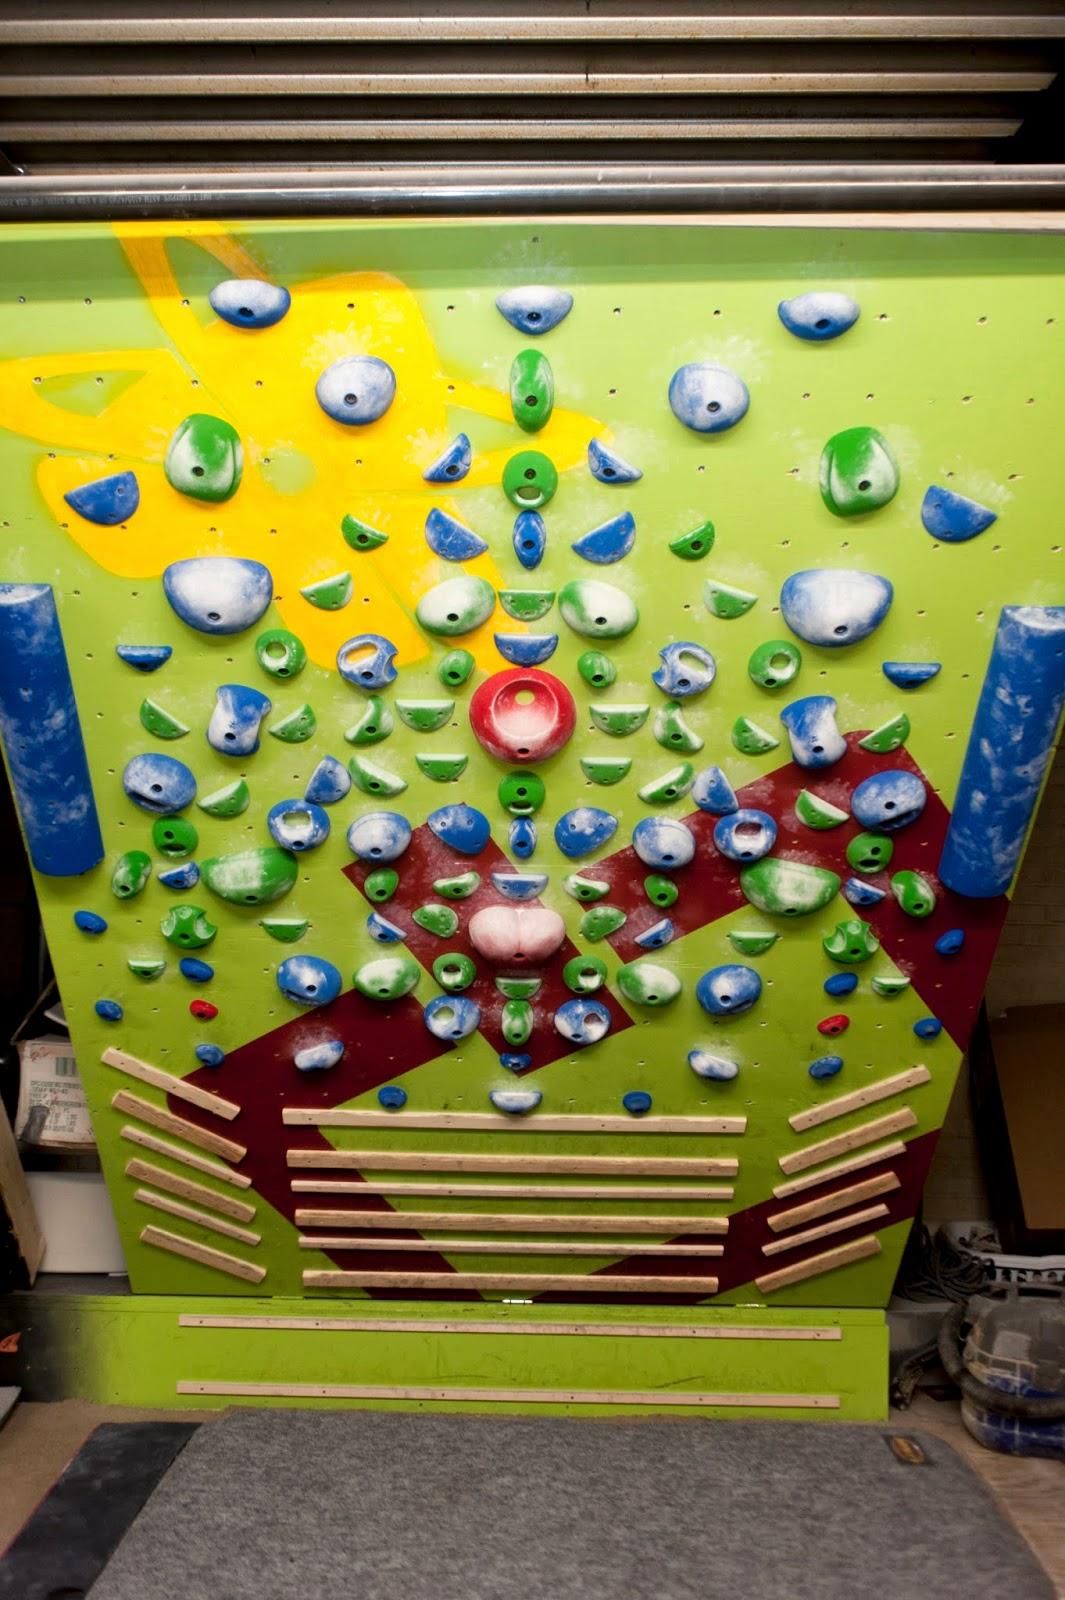 Kris Hampton's mirror board setup .